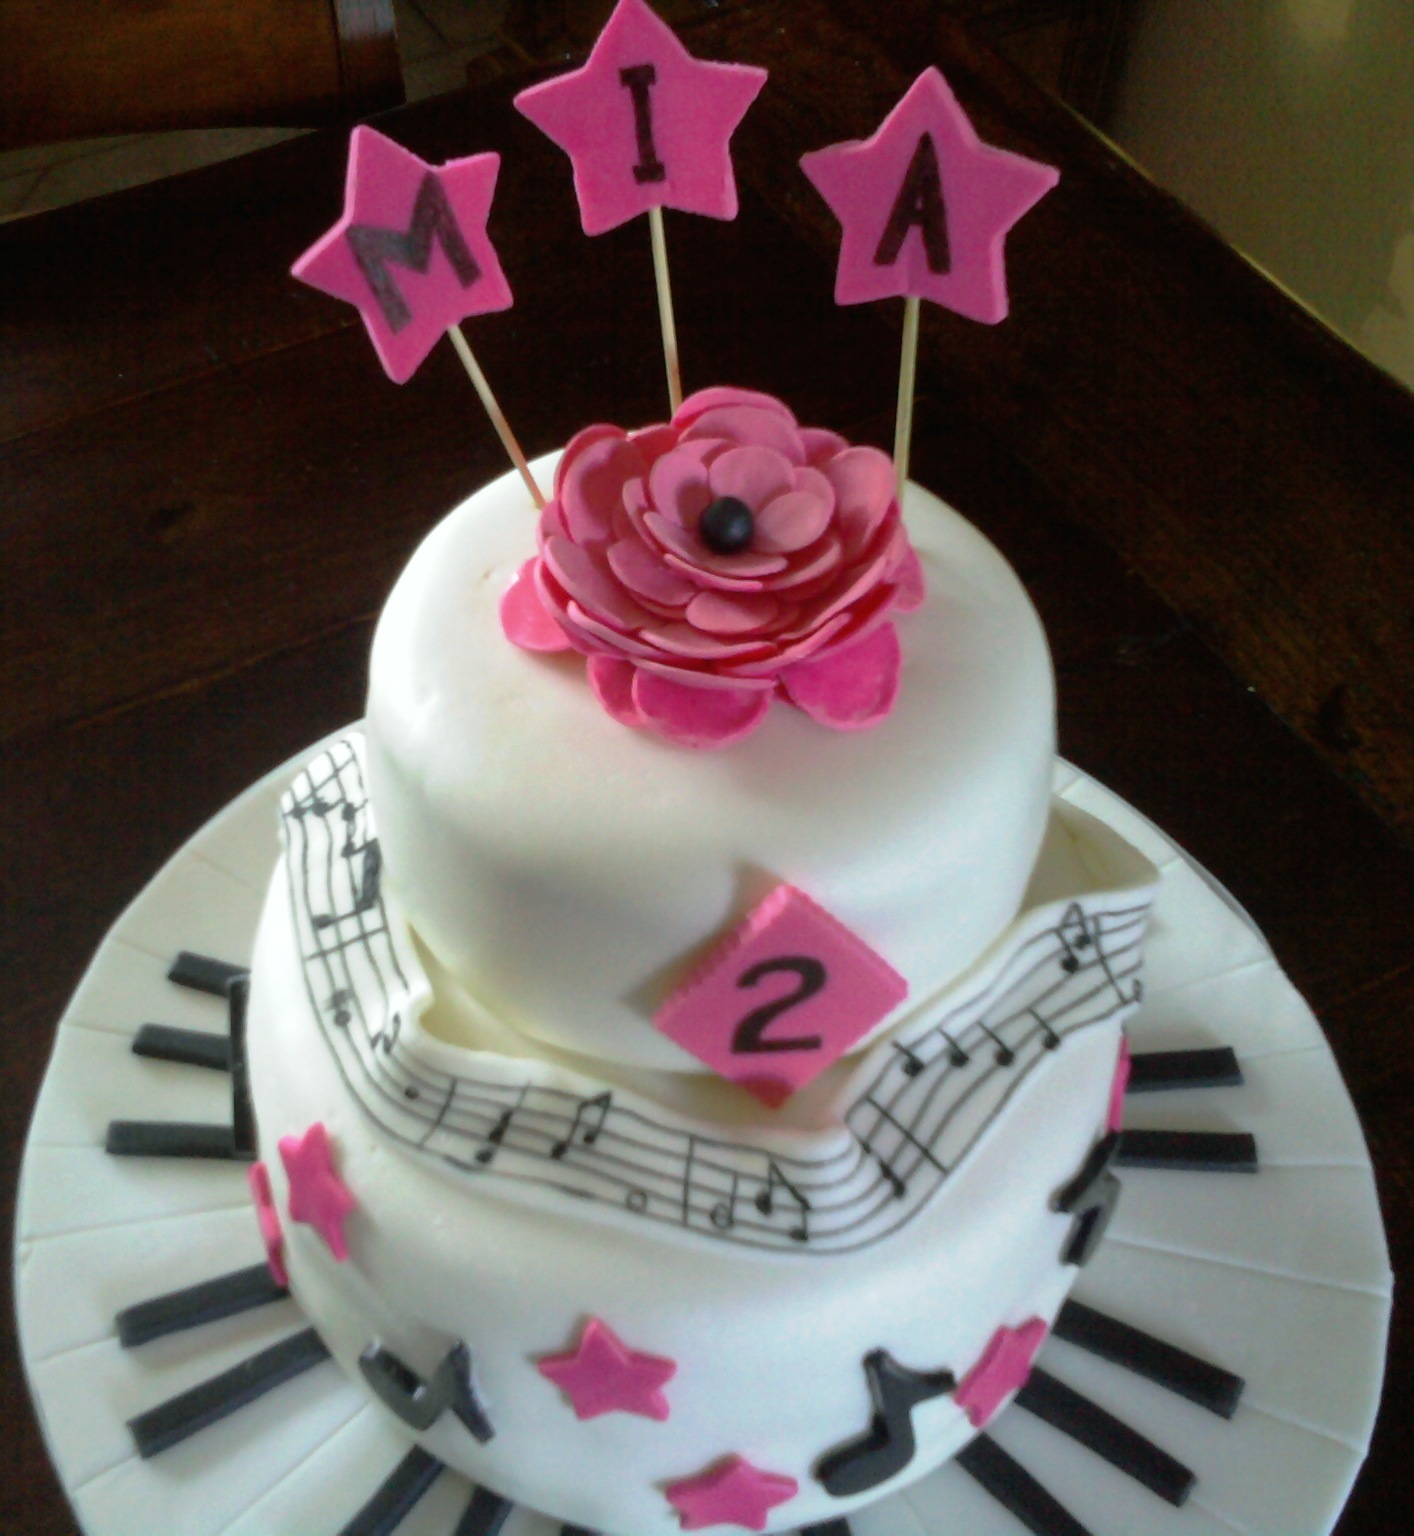 AimeeJo Desserts Mias 2 Year Old Birthday Cake